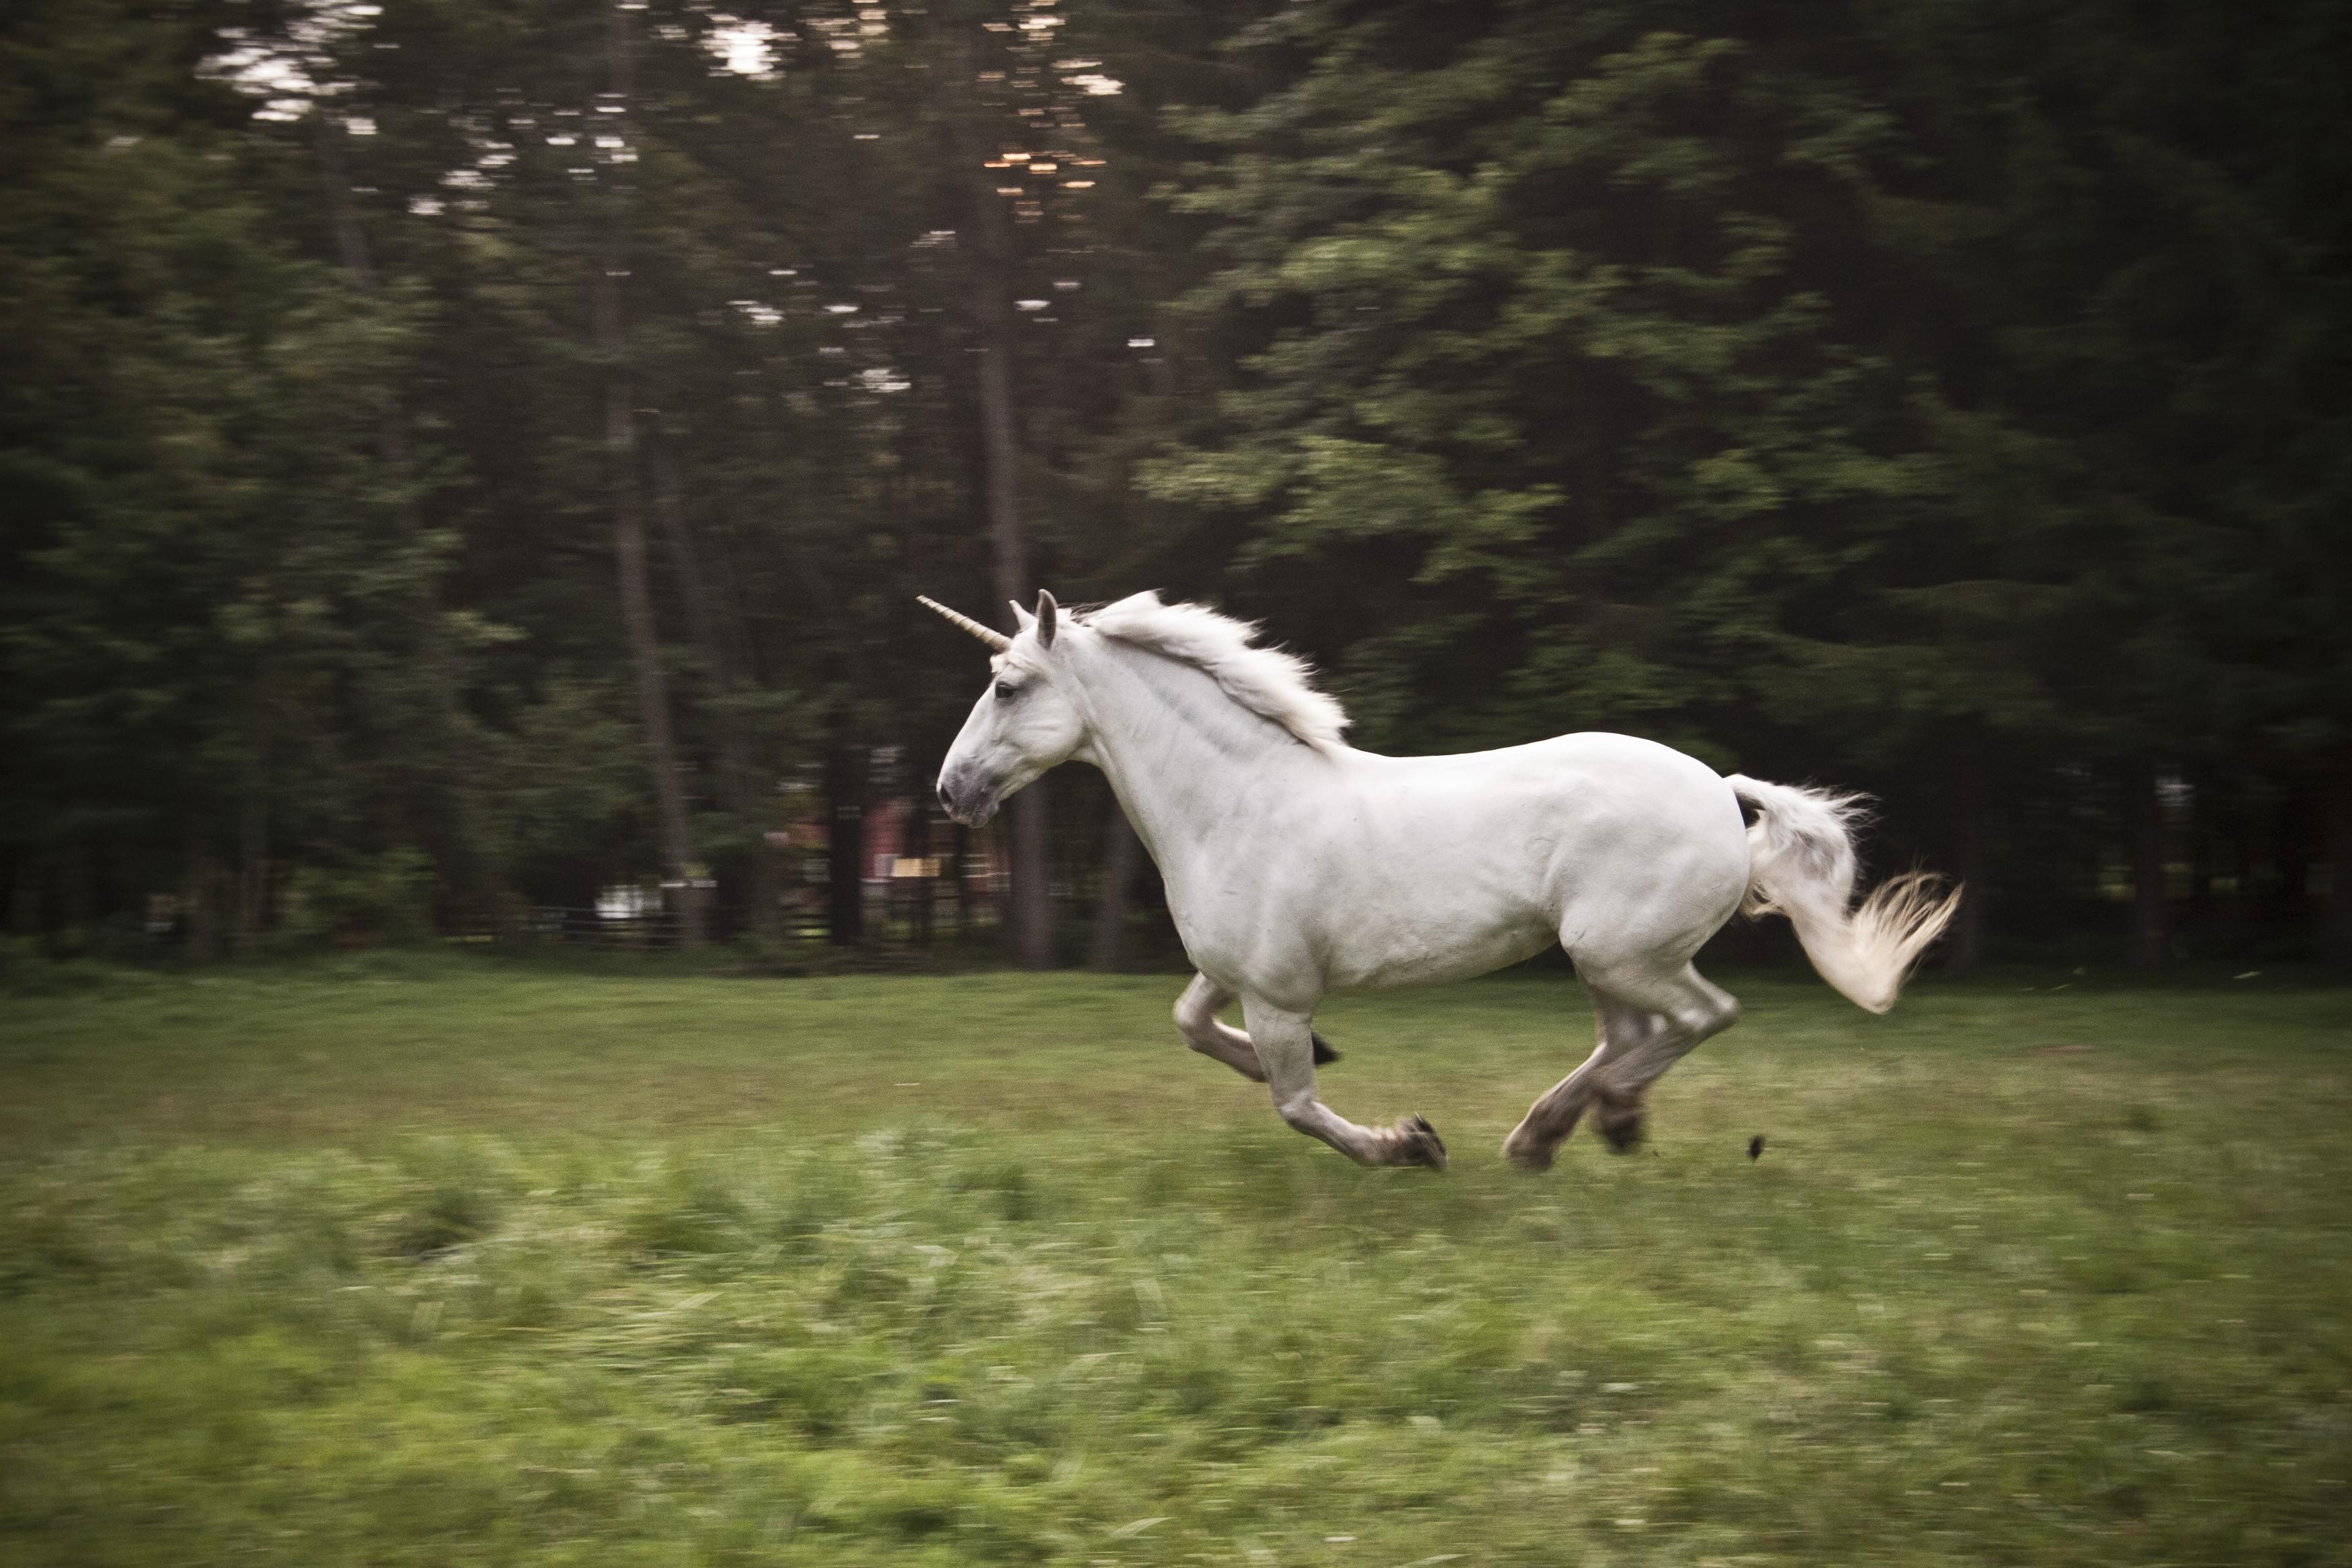 unicorn Wallpaper, Animals / Wild: unicorn, horse, nature, white Unicorn Background